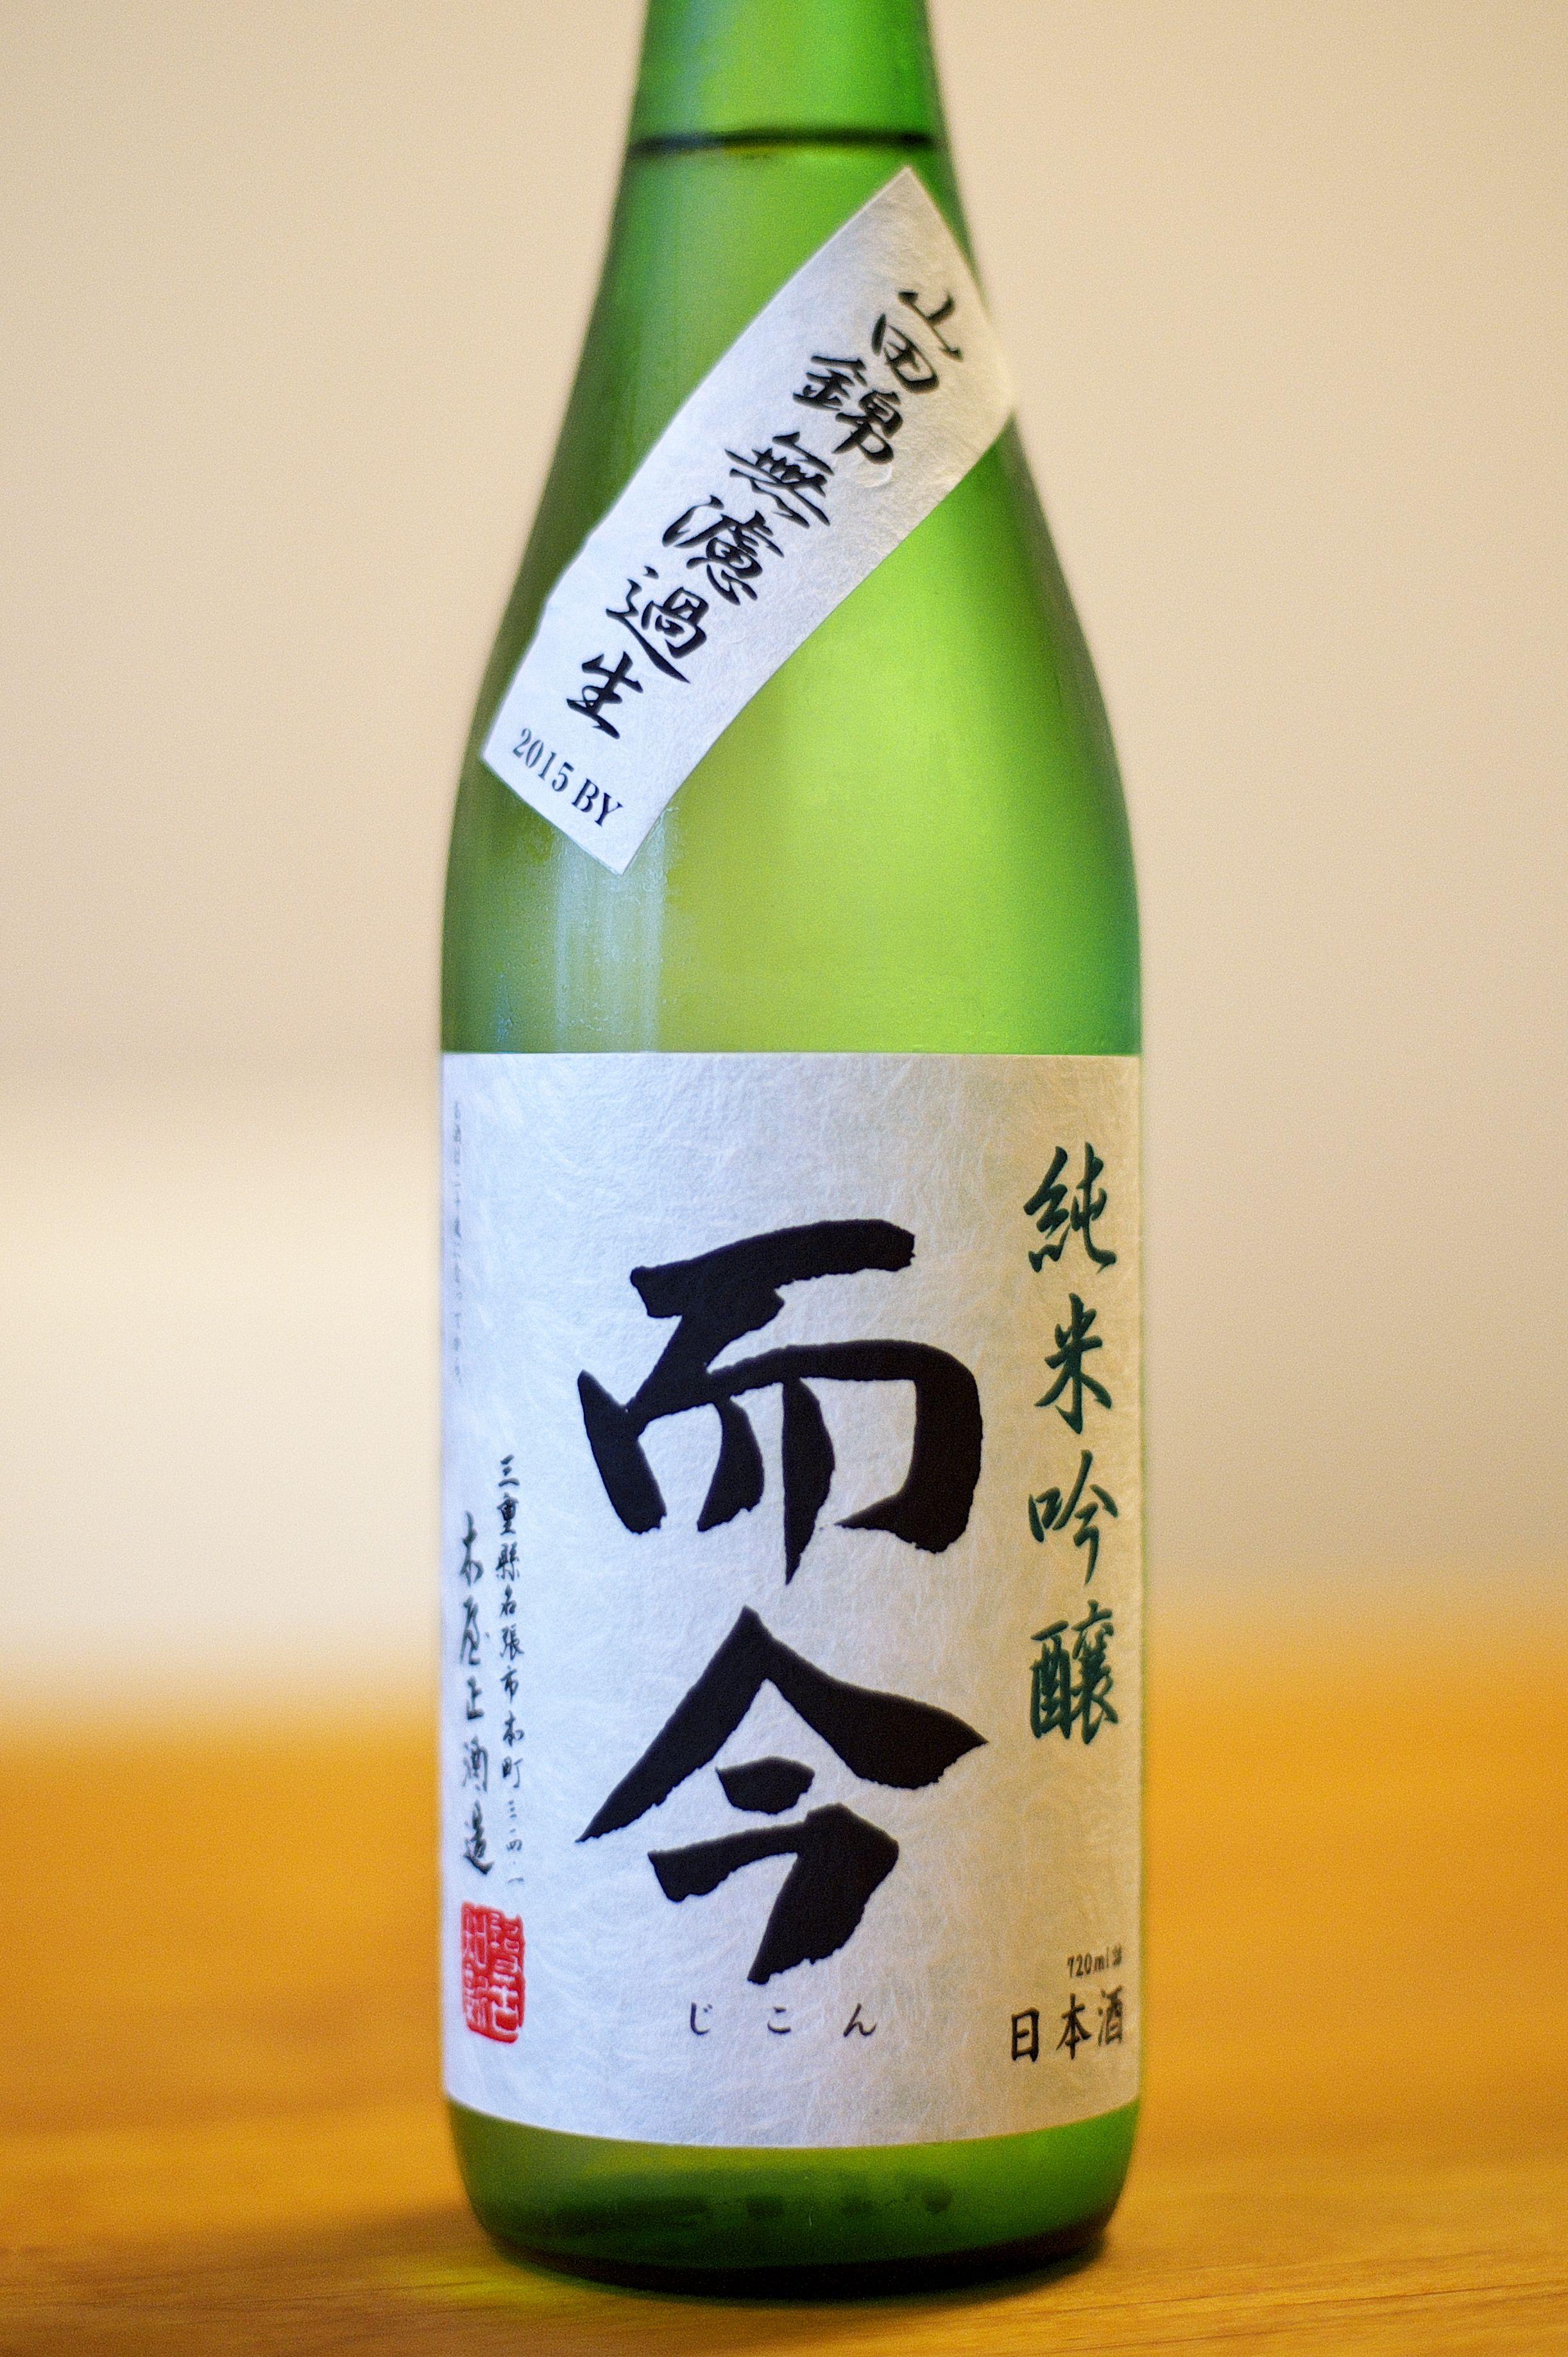 jikon junmaiginjo yamadanishiki muroka nama sake 而今 純米吟醸 山田錦 無濾過生 日本酒